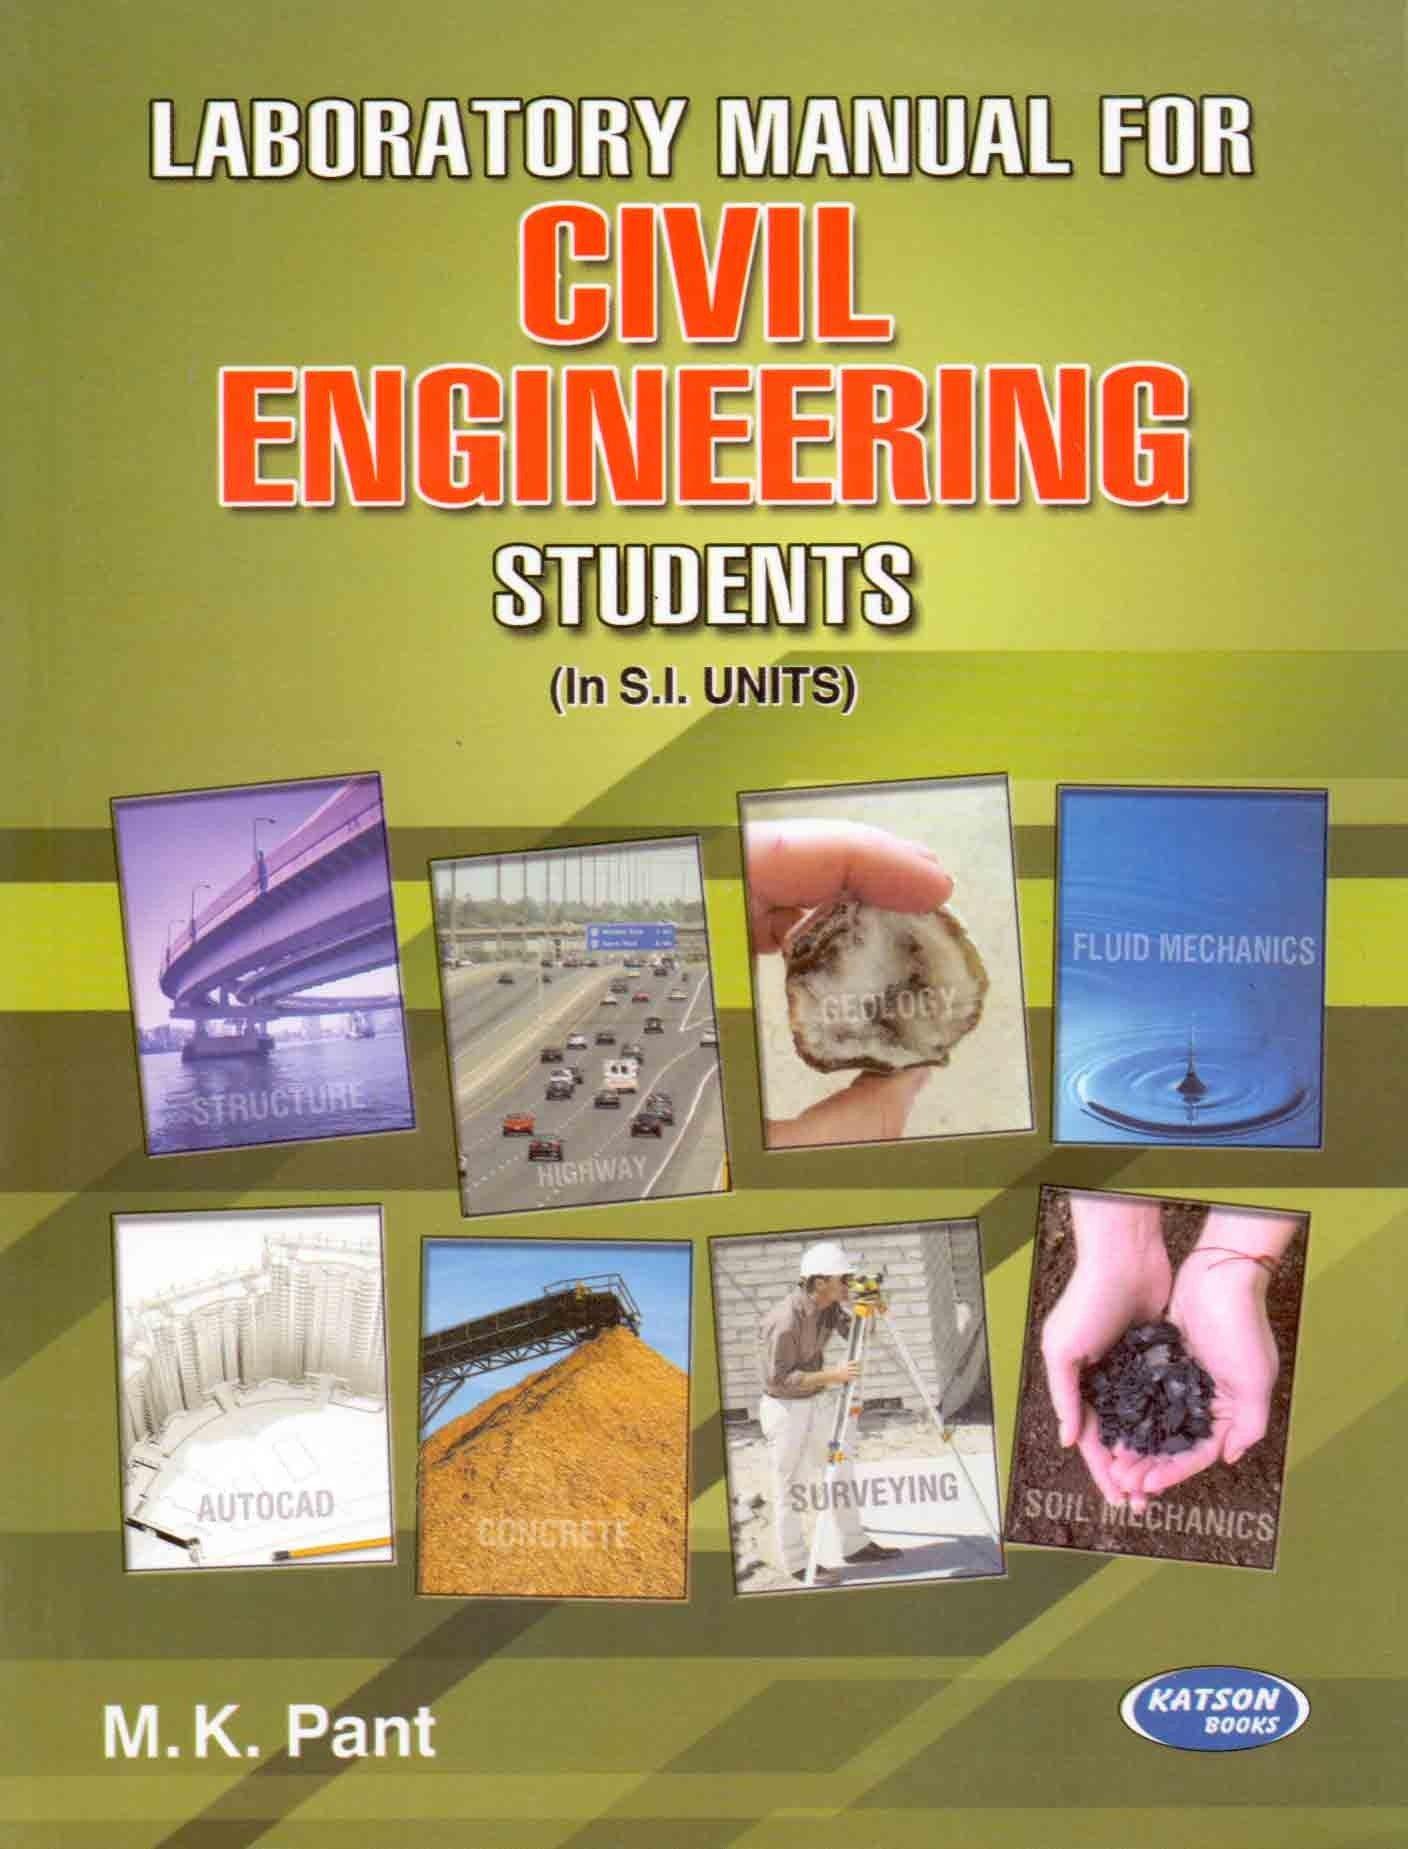 fluid mechanics civil lab manual